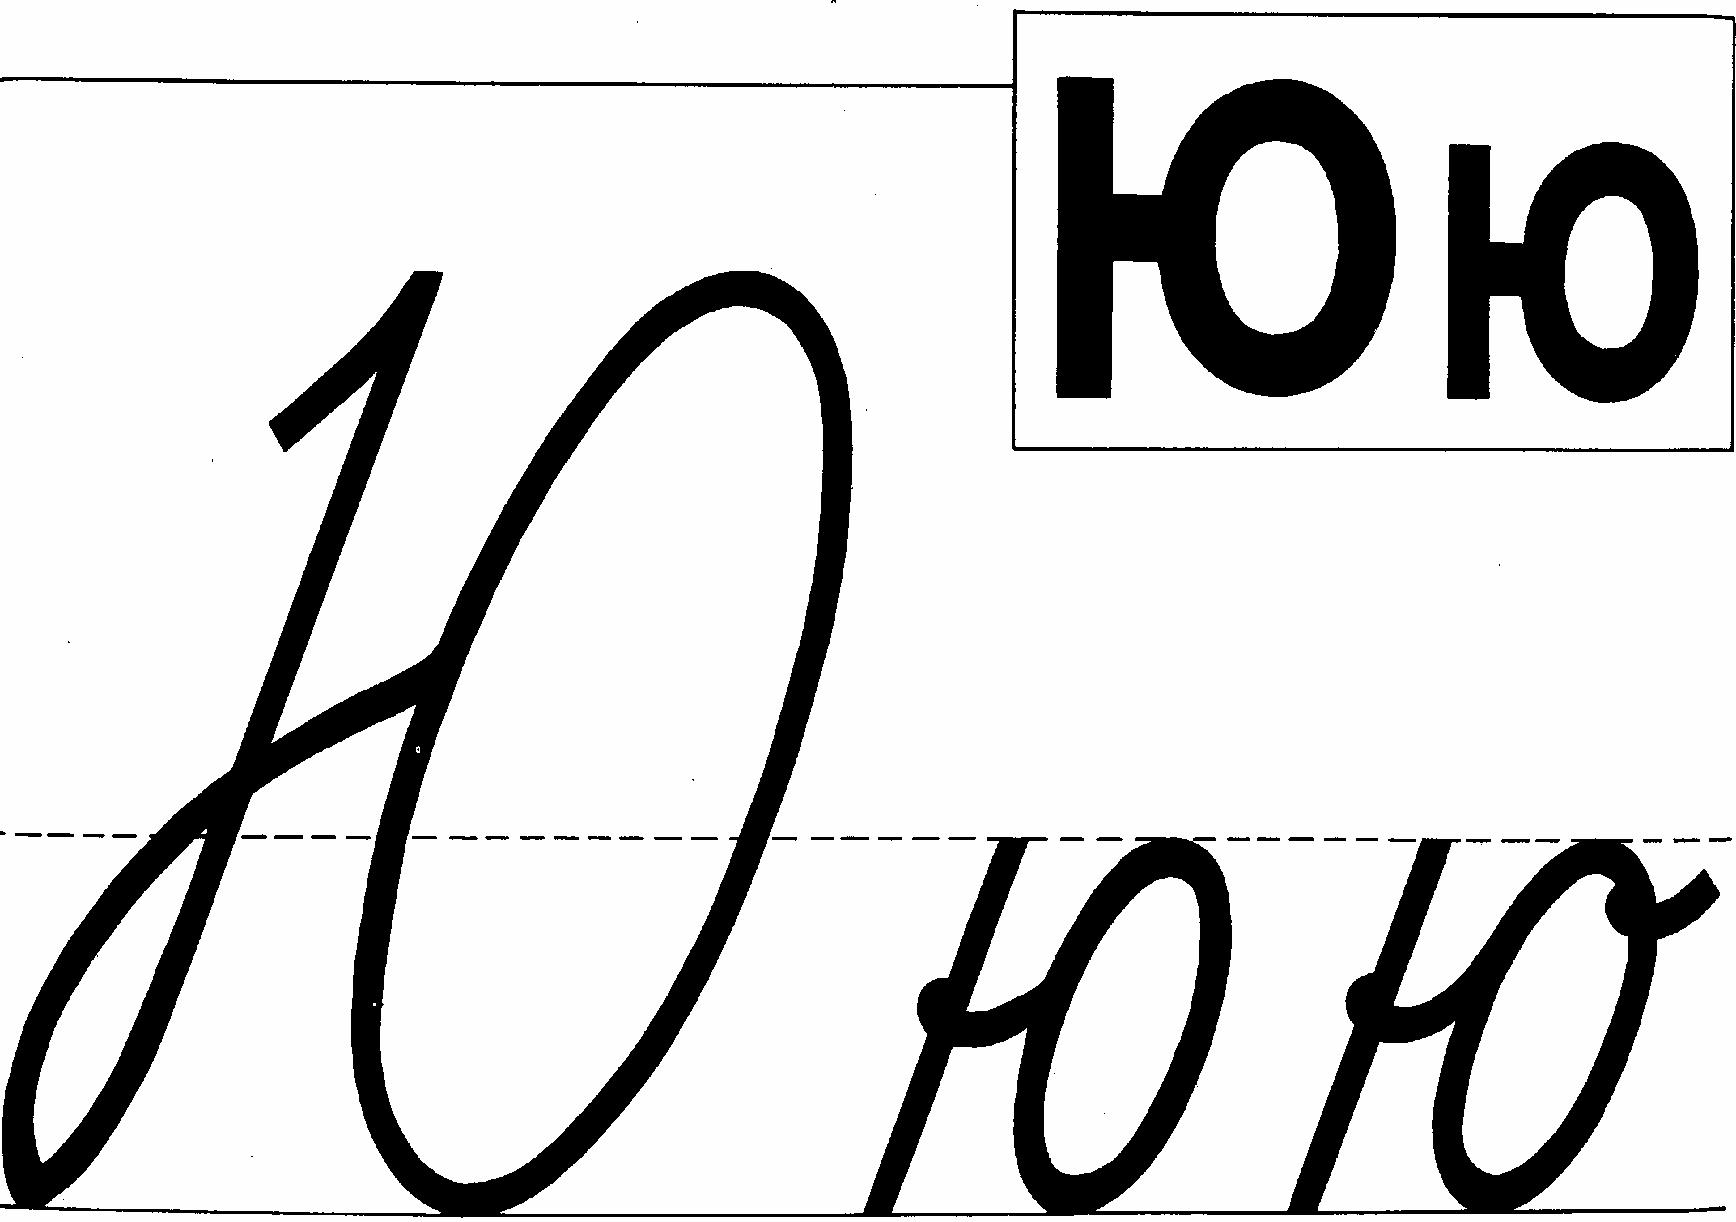 99013844